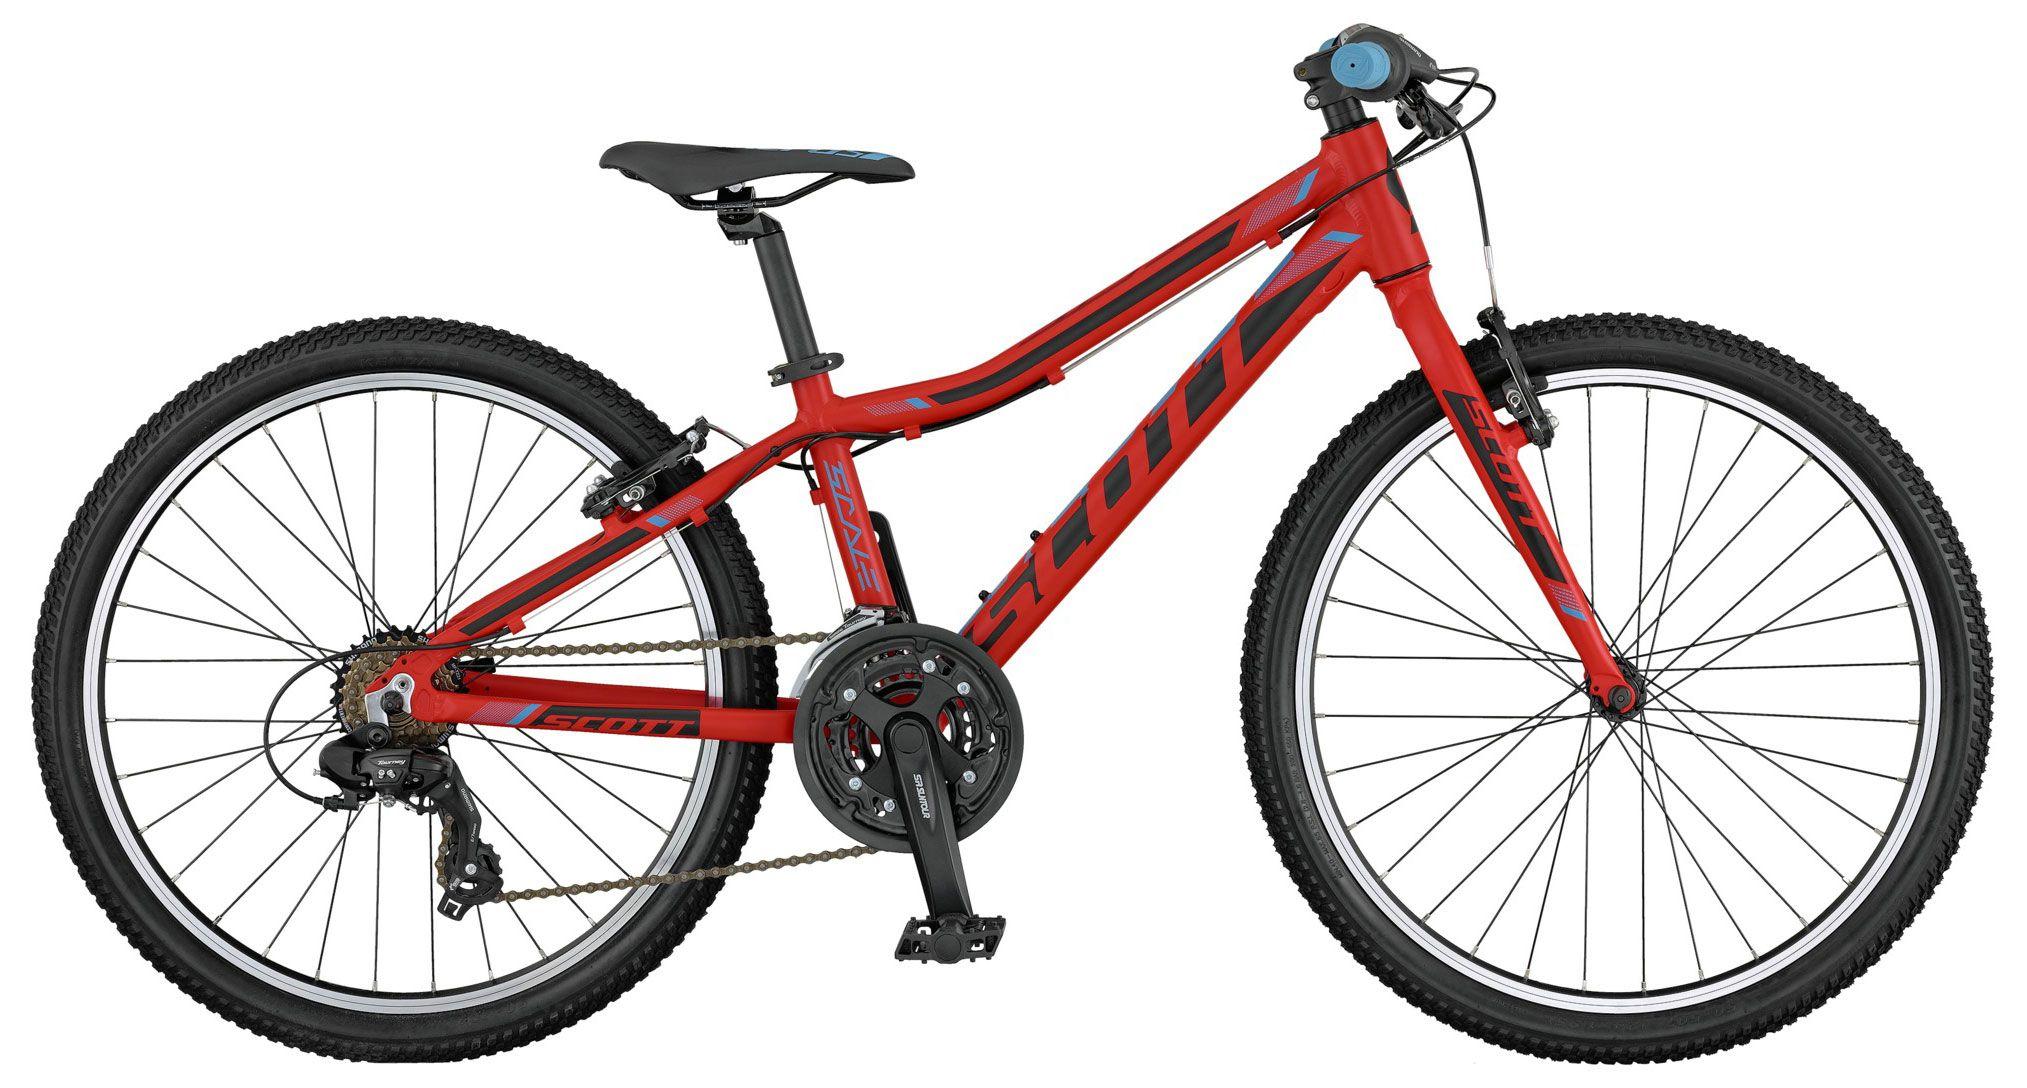 Велосипед Scott Scale JR 24 rigid fork 2017 велосипед scott scale jr 24 rigid fork 2017